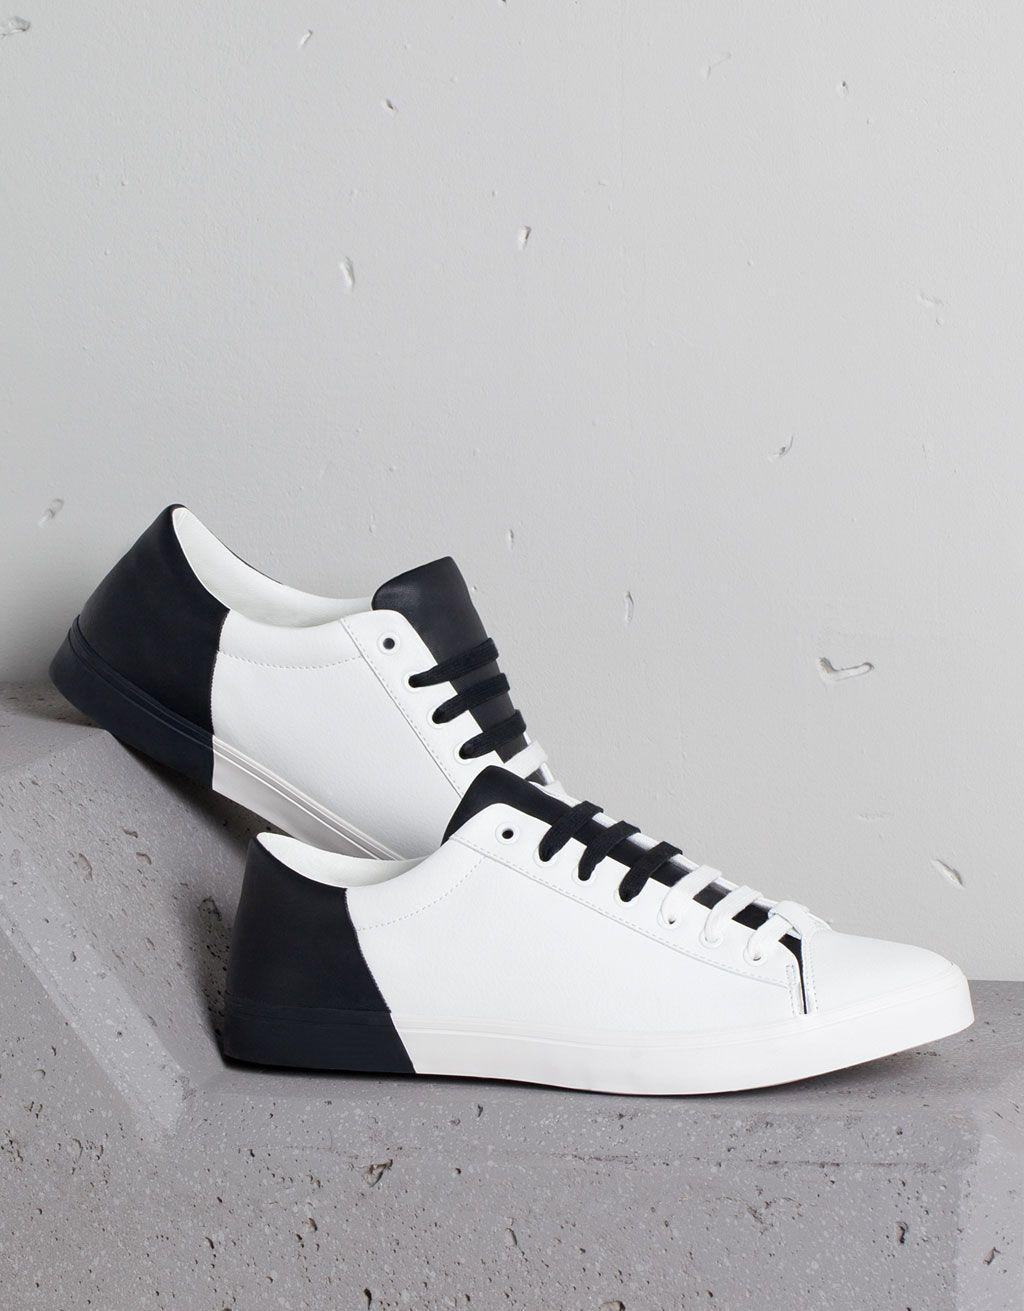 online store 21808 032ac Basic contrast sneakers - Buty - Bershka Poland Zapatos Bershka, Zapatos  2017, Zapatos Casuales